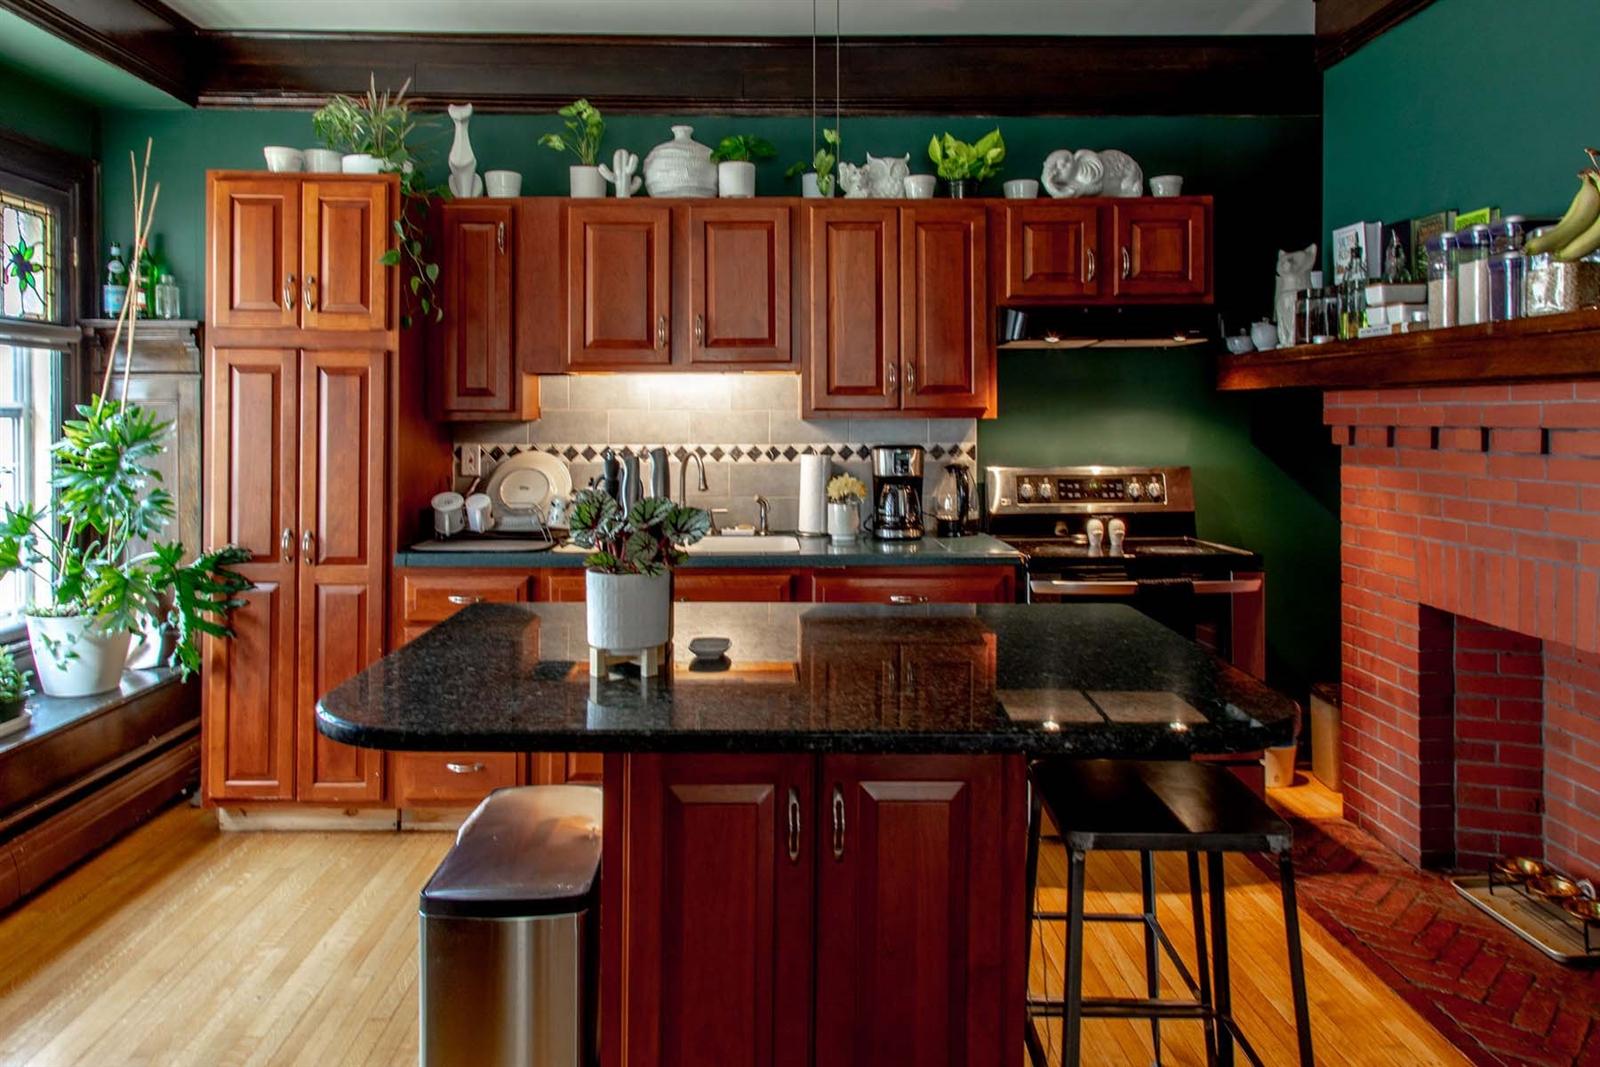 billy pat kitchen.jpg